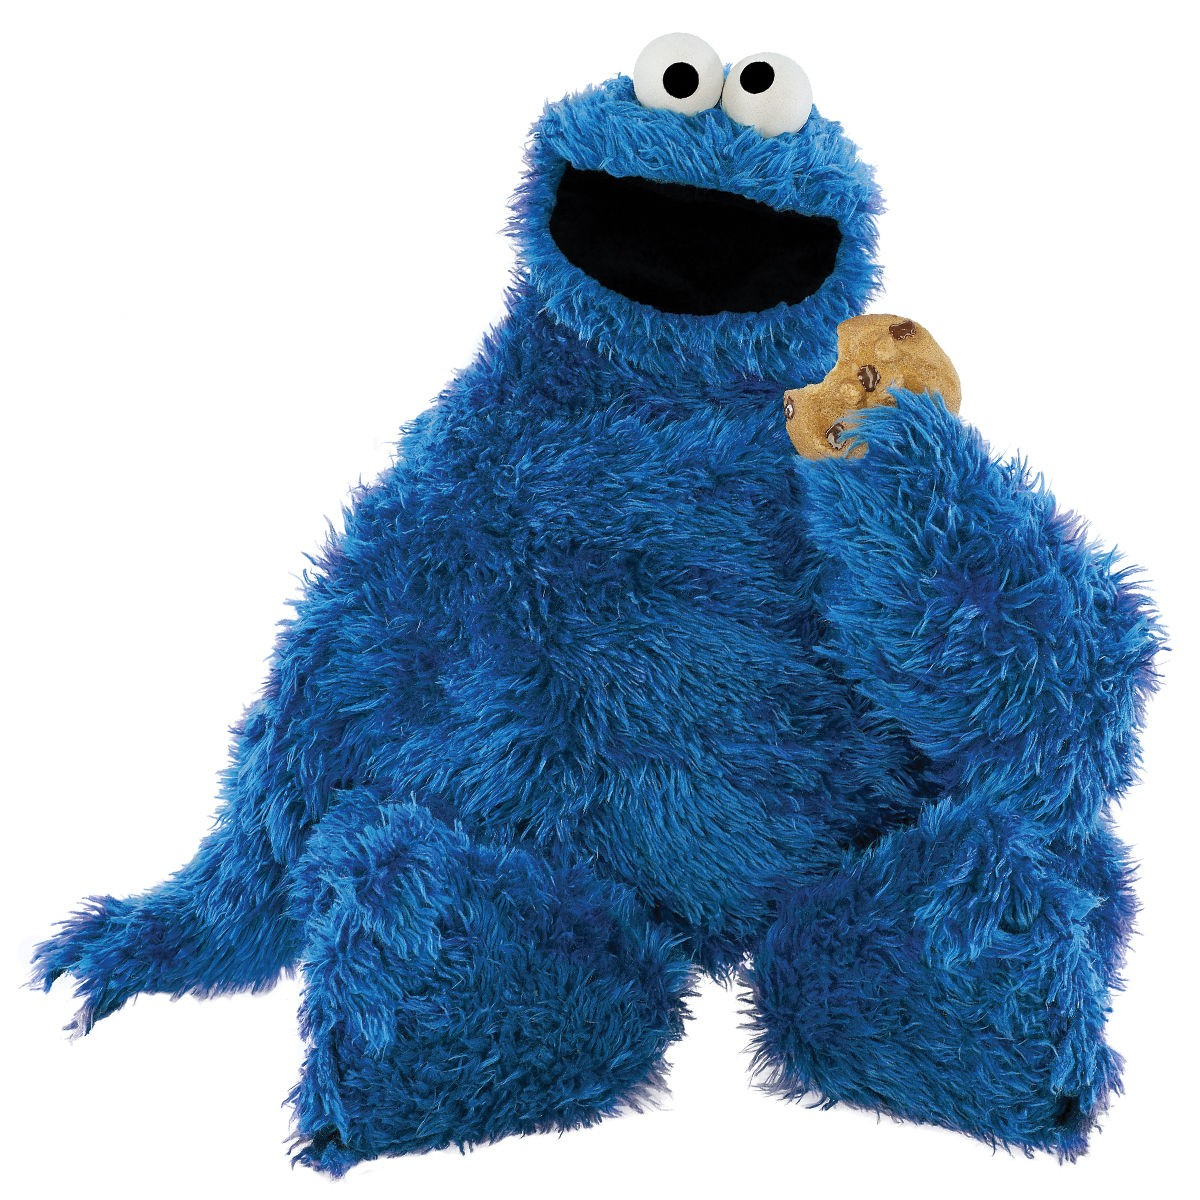 Cookie Monster Clip Art - ClipArt Best